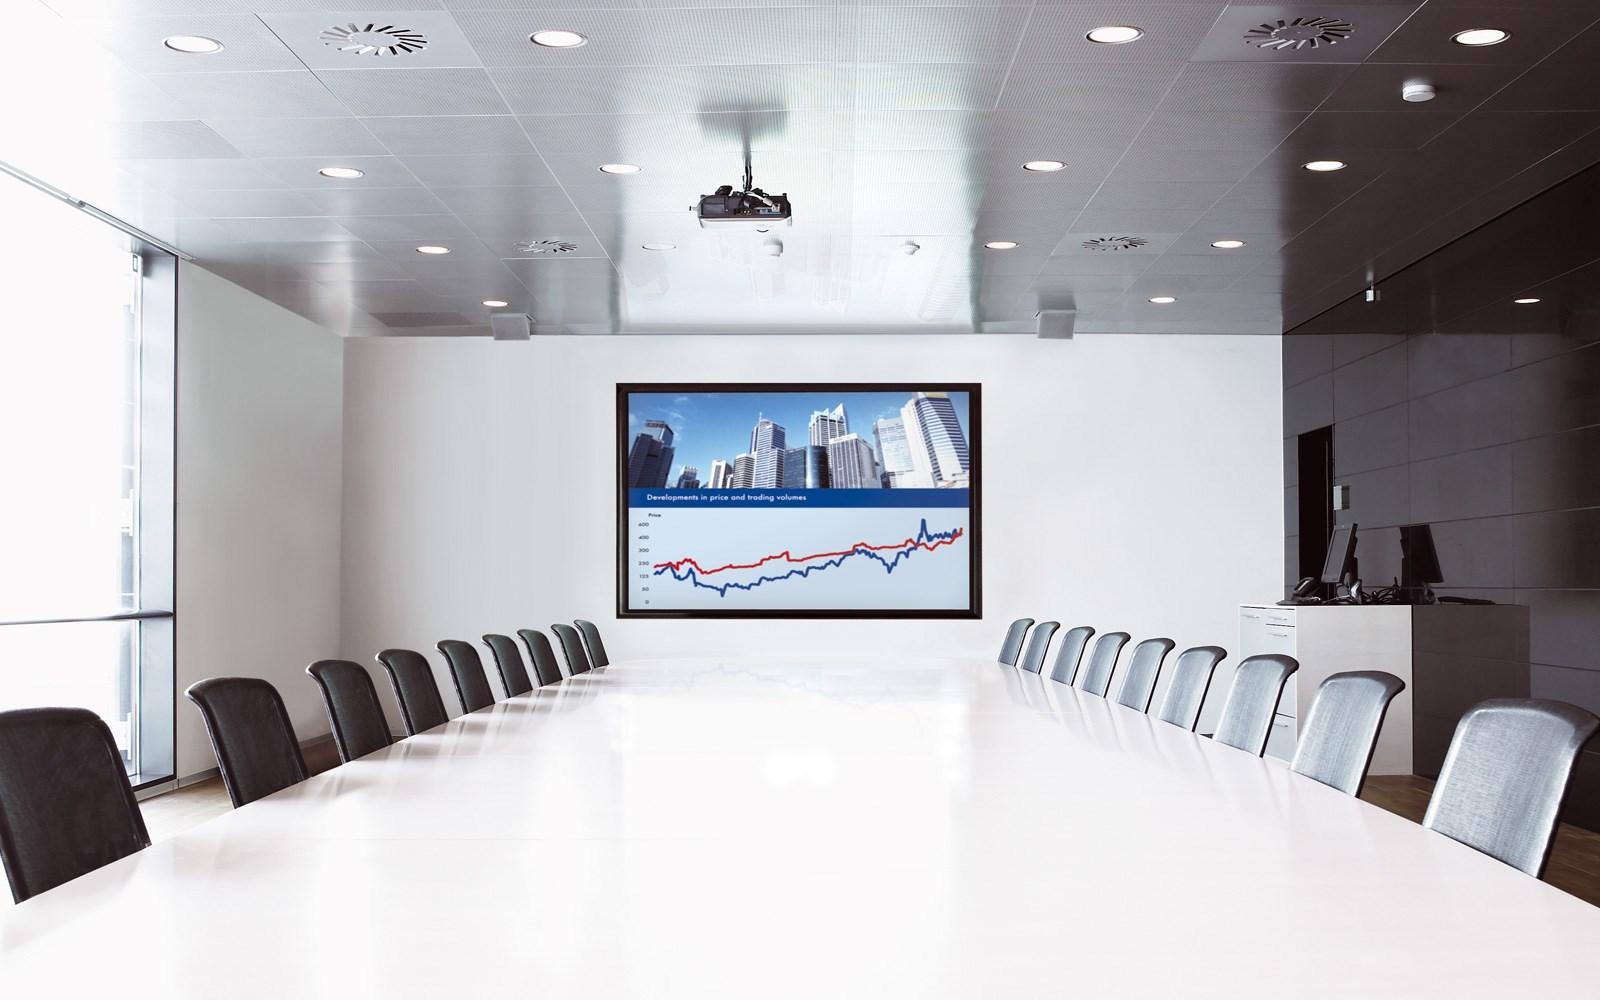 ویدئو پروژکتور مناسب سیستم کنفرانس